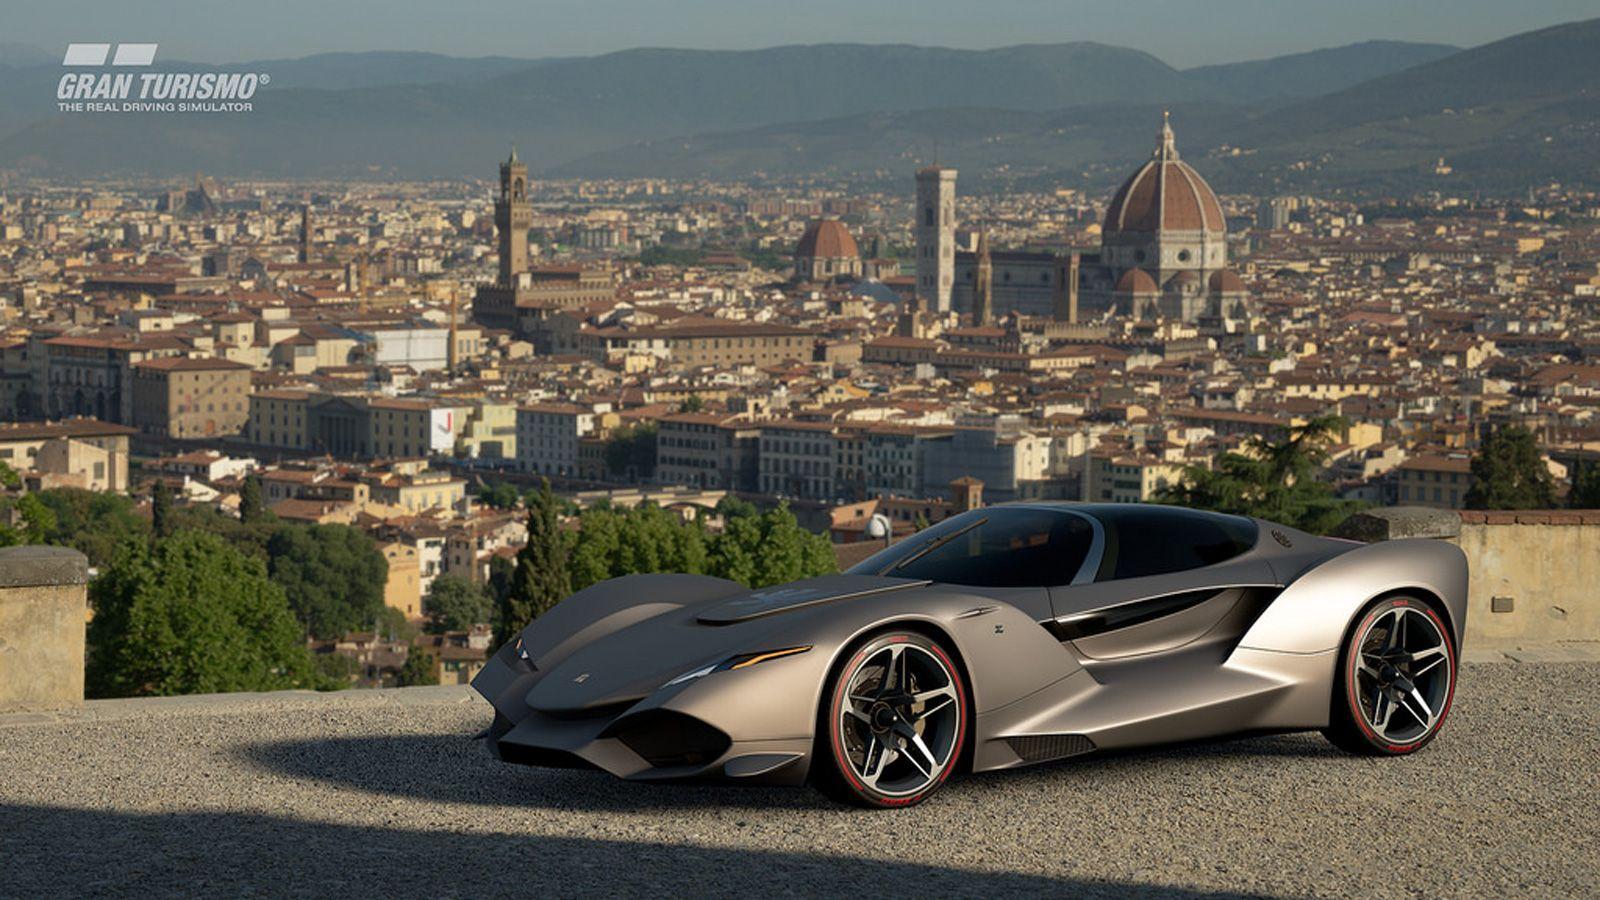 'Gran Turismo Sport' brings back a classic solo racing